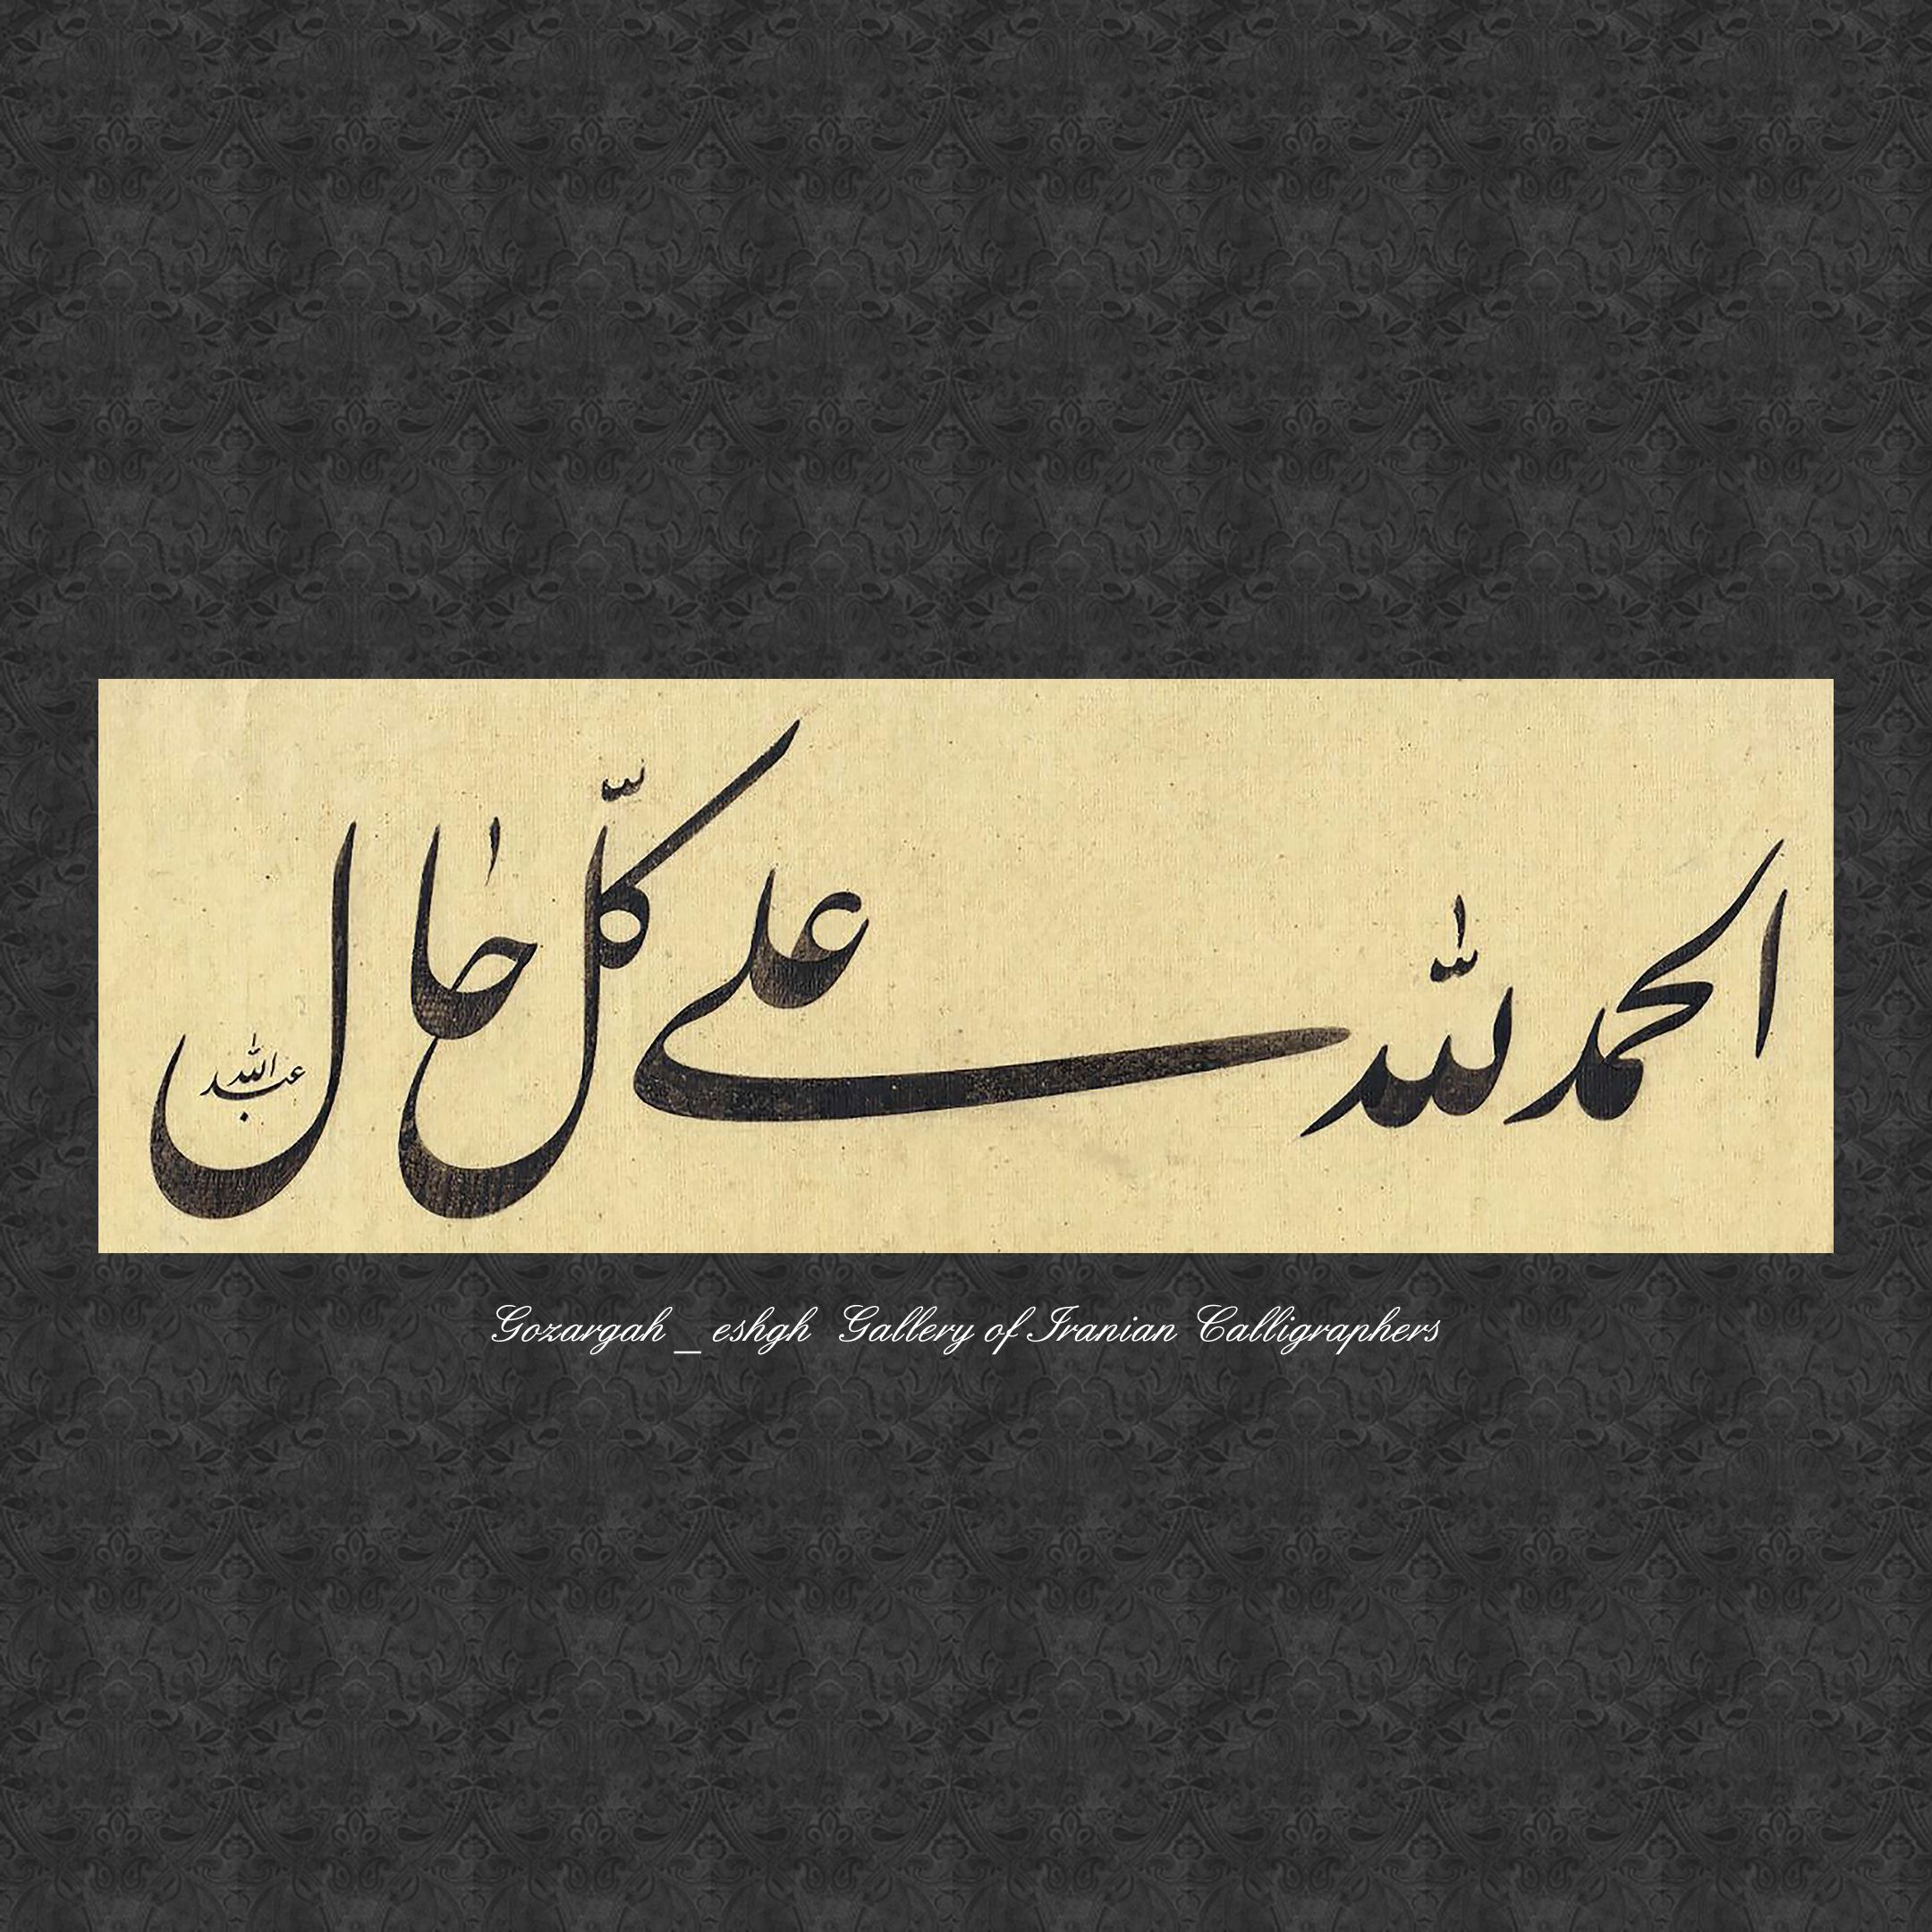 الحمدلله علی کل حال Calligrapher Eshgh Arabic Calligraphy